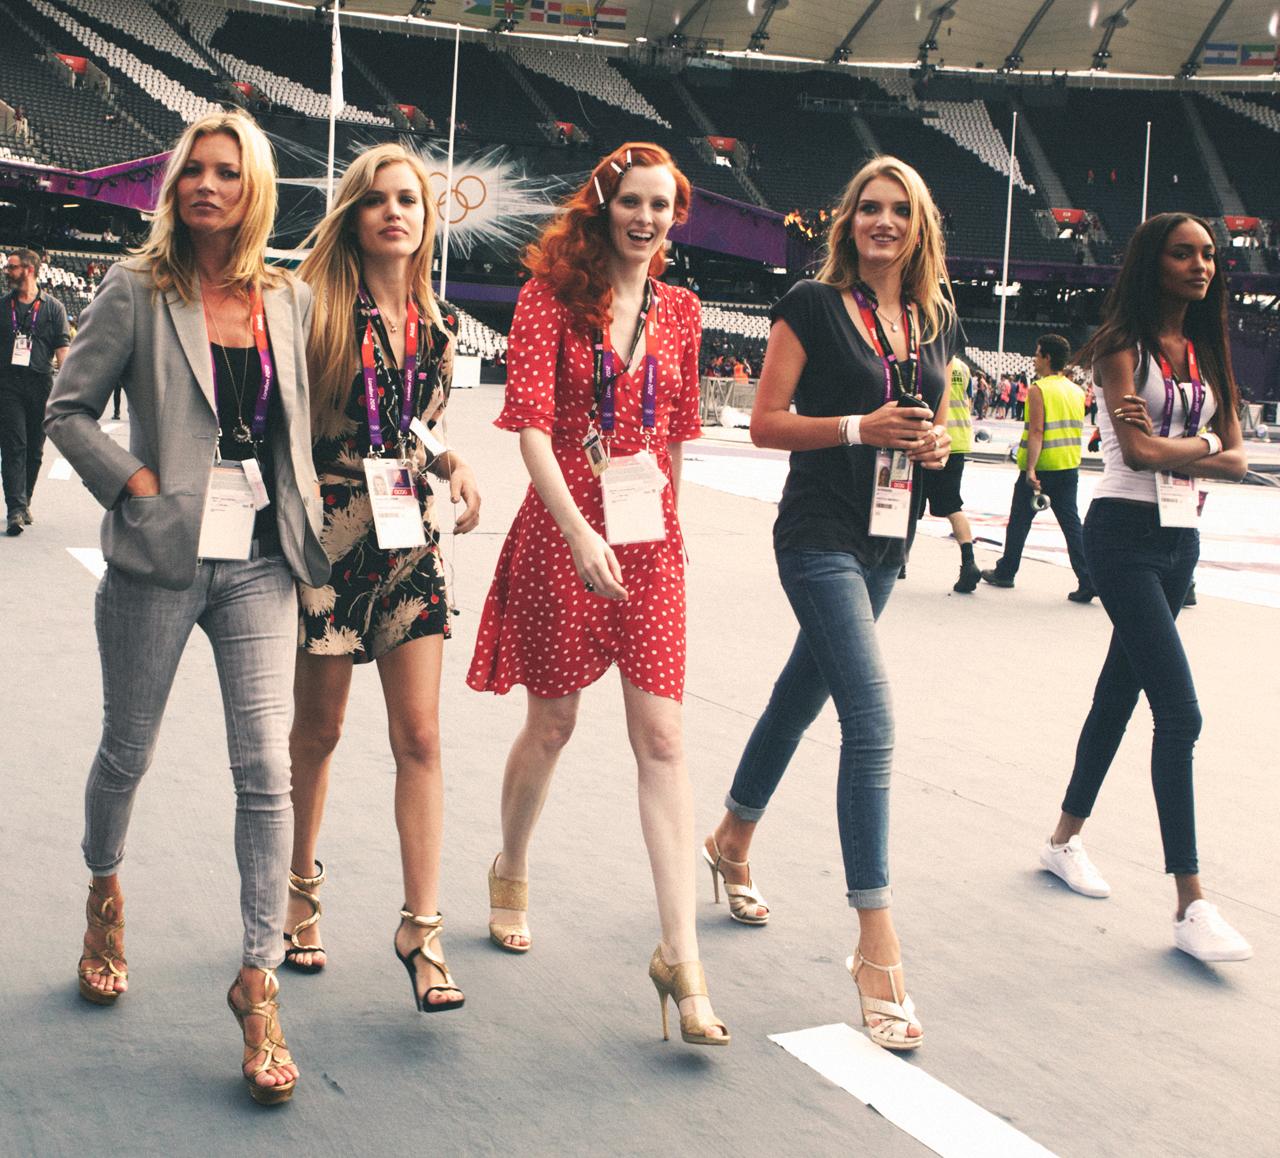 http://4.bp.blogspot.com/-0SaDHGbadfc/UC5uyX9EBkI/AAAAAAAAm6U/S41RY5mmNrE/s1600/la-modella-mafia-Olympics-2012-Closing-Ceremonies-fashion-with-top-British-models-Kate-Moss-Georgia-May-Jagger-Karen-Elson-Lily-Donaldson-Jordan-Dunn-Lily-Cole-Stella-Tenant-and-Naomi-Campbell-1.jpeg